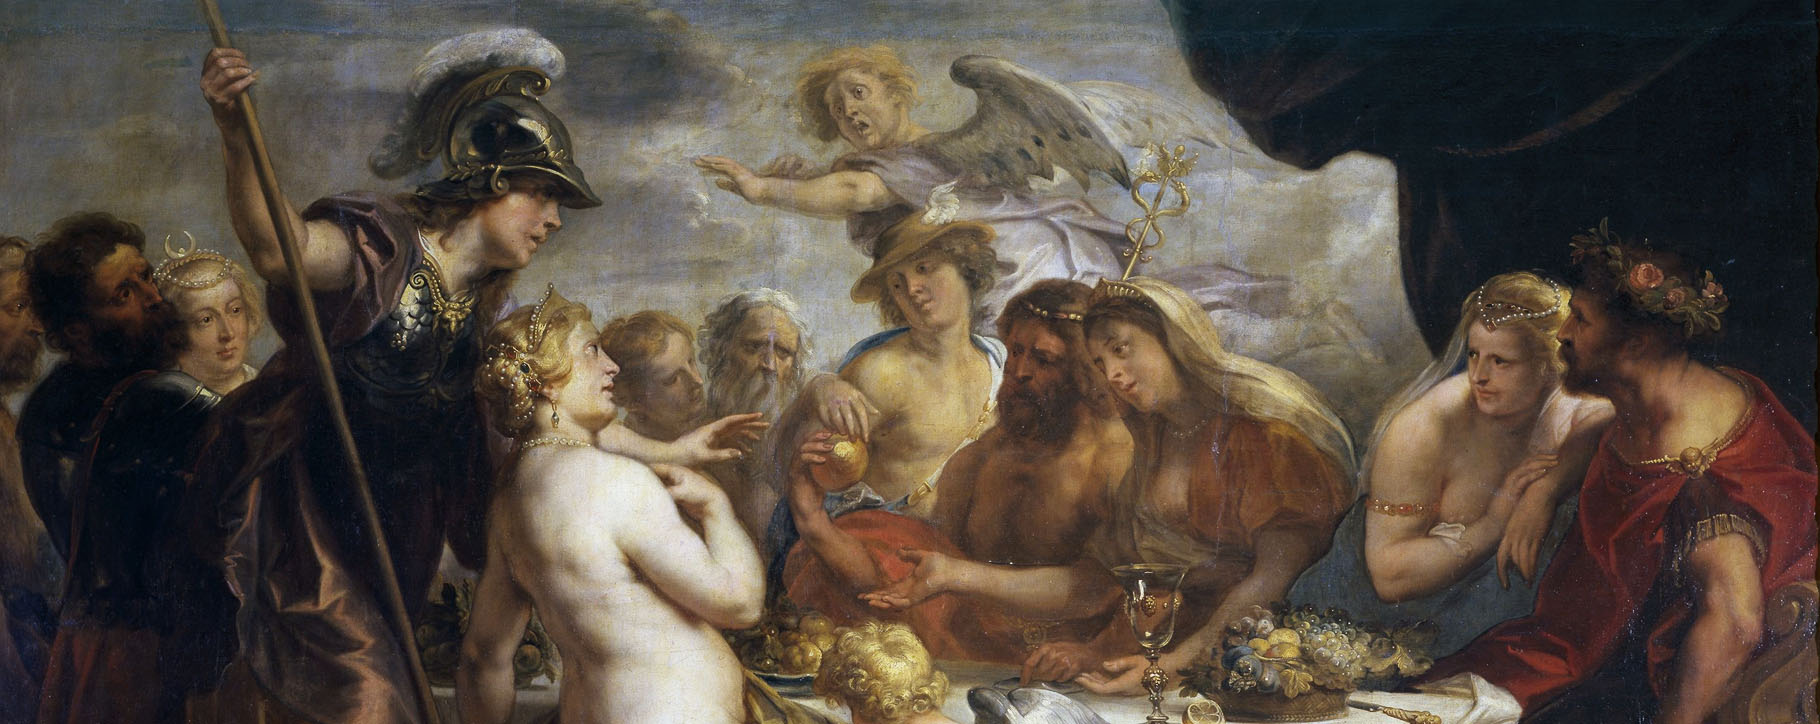 Jacob Jordaens classical painting